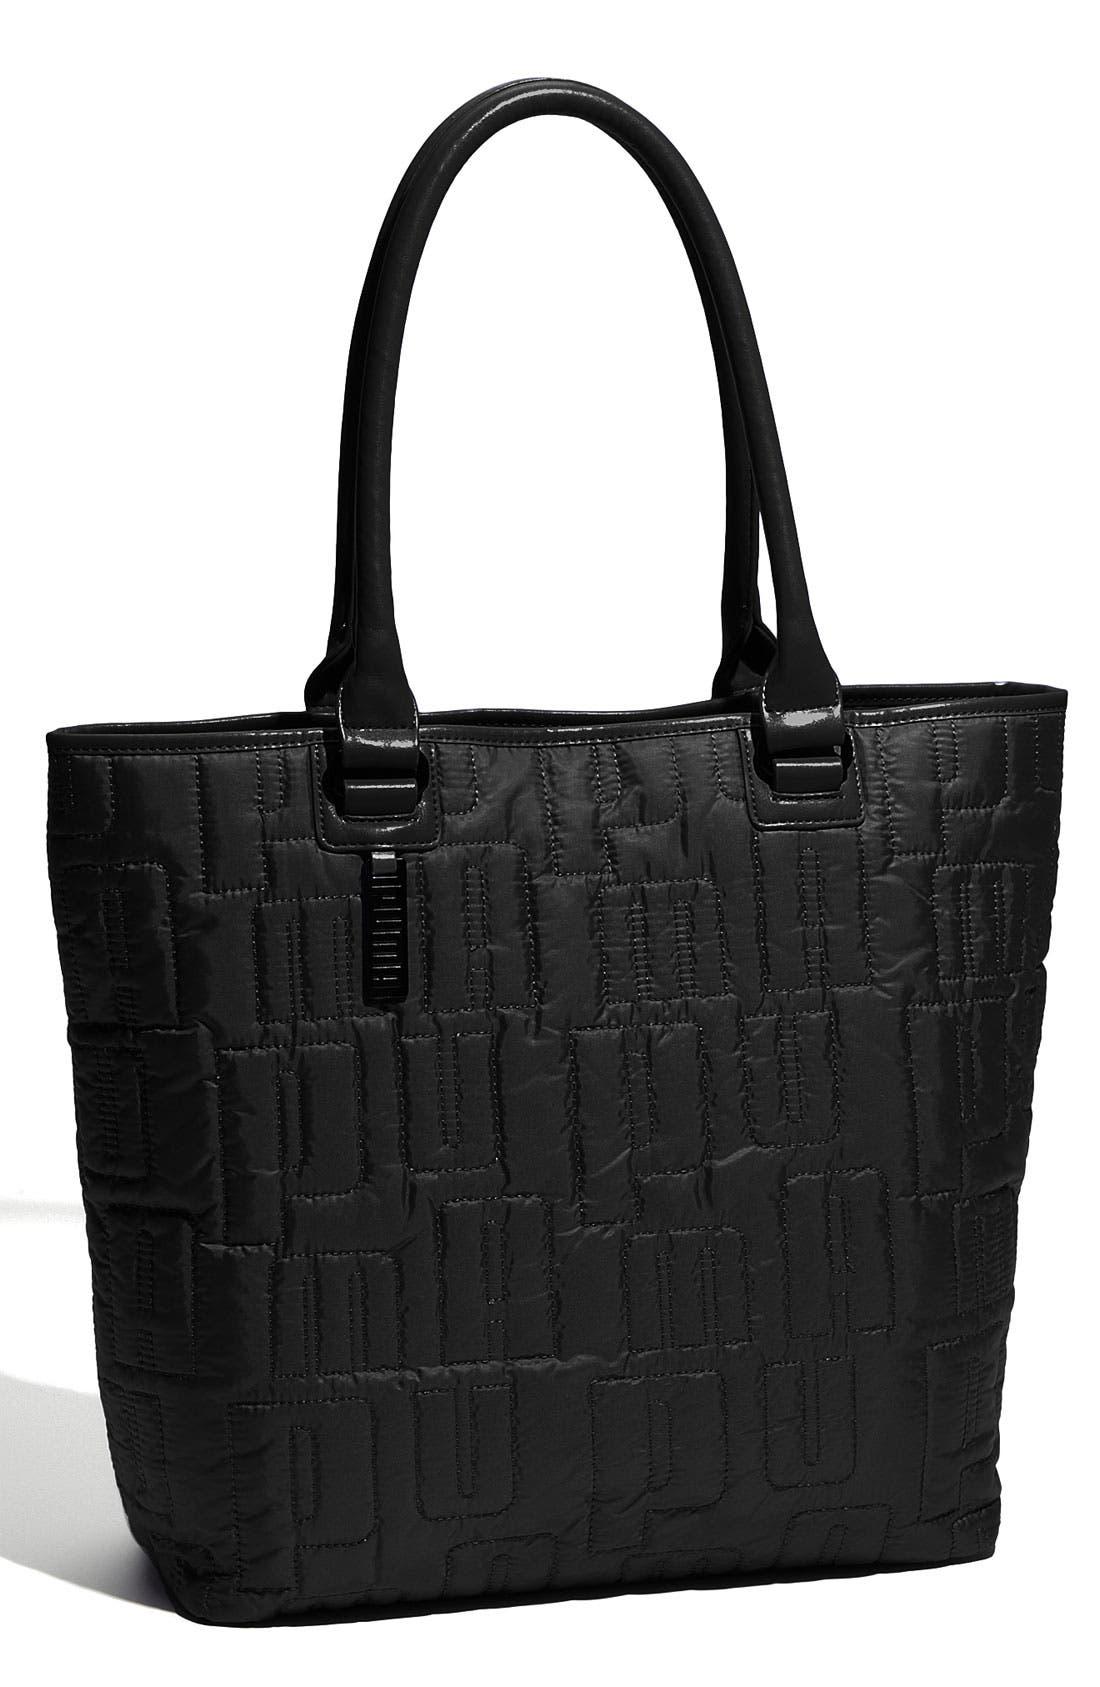 Alternate Image 1 Selected - PUMA 'Avenue' Tote Bag